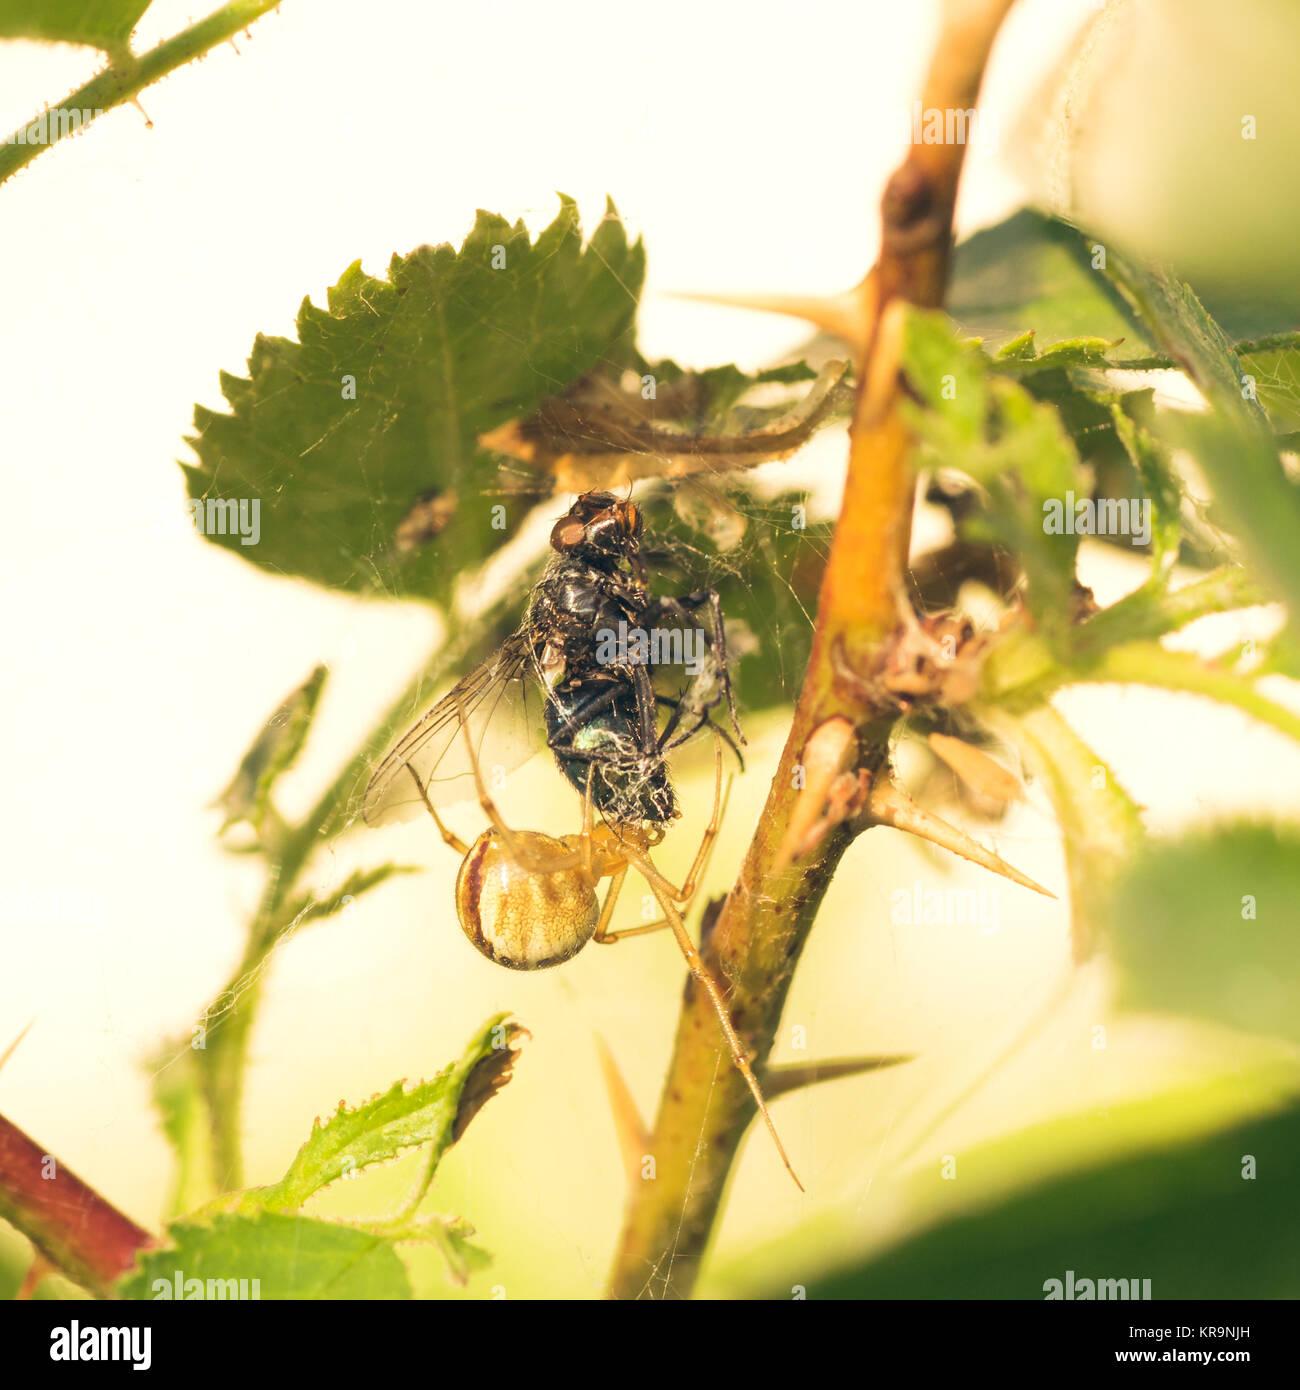 Cobweb Spider Eating Fly - Stock Image